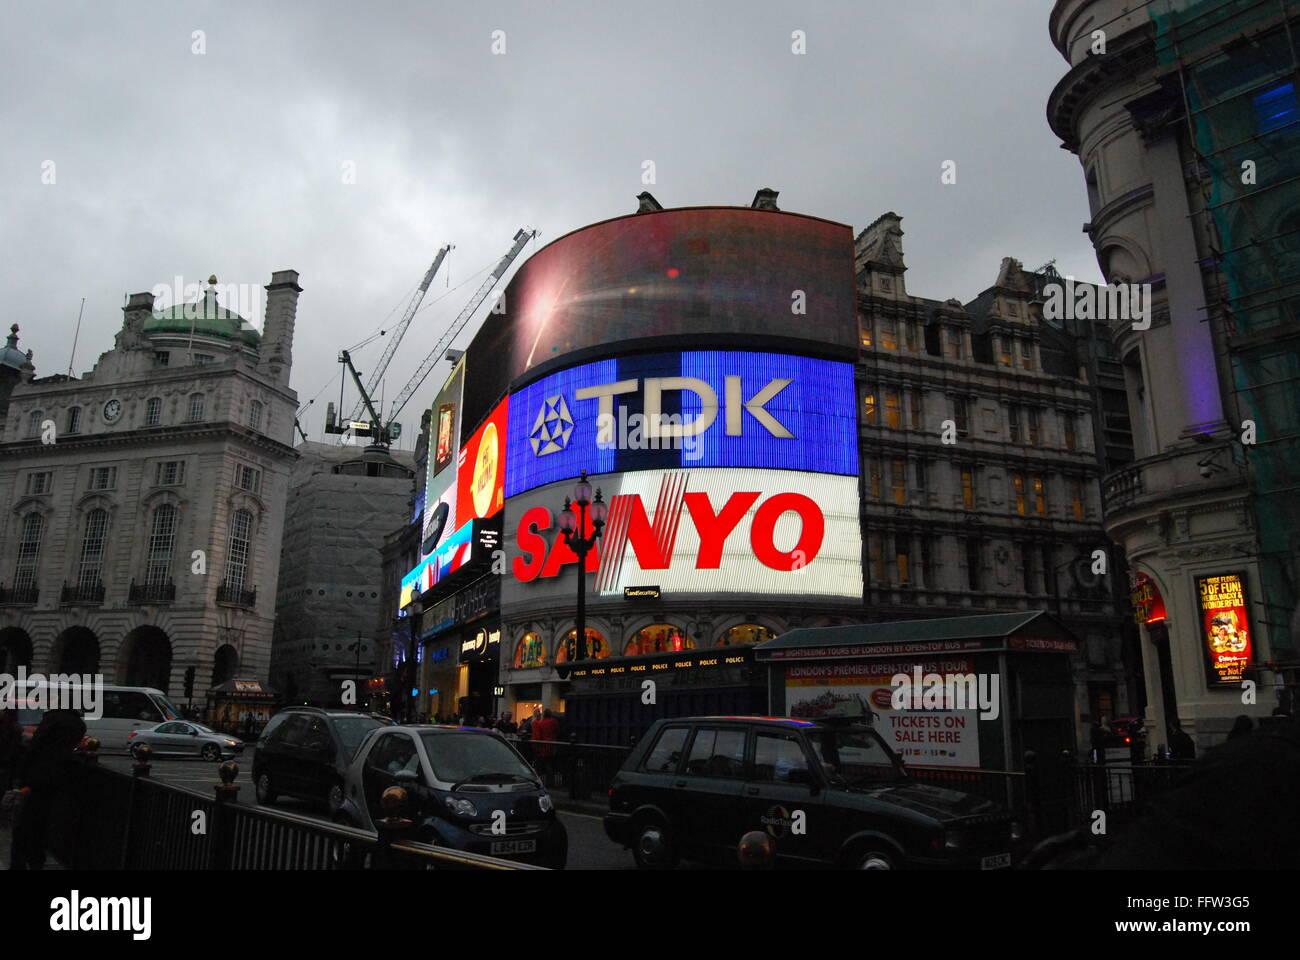 London -  07/05/2009  -  United Kingdom / England / London  -  Picadilly Circus   -  Sandrine Huet / Le Pictorium - Stock Image